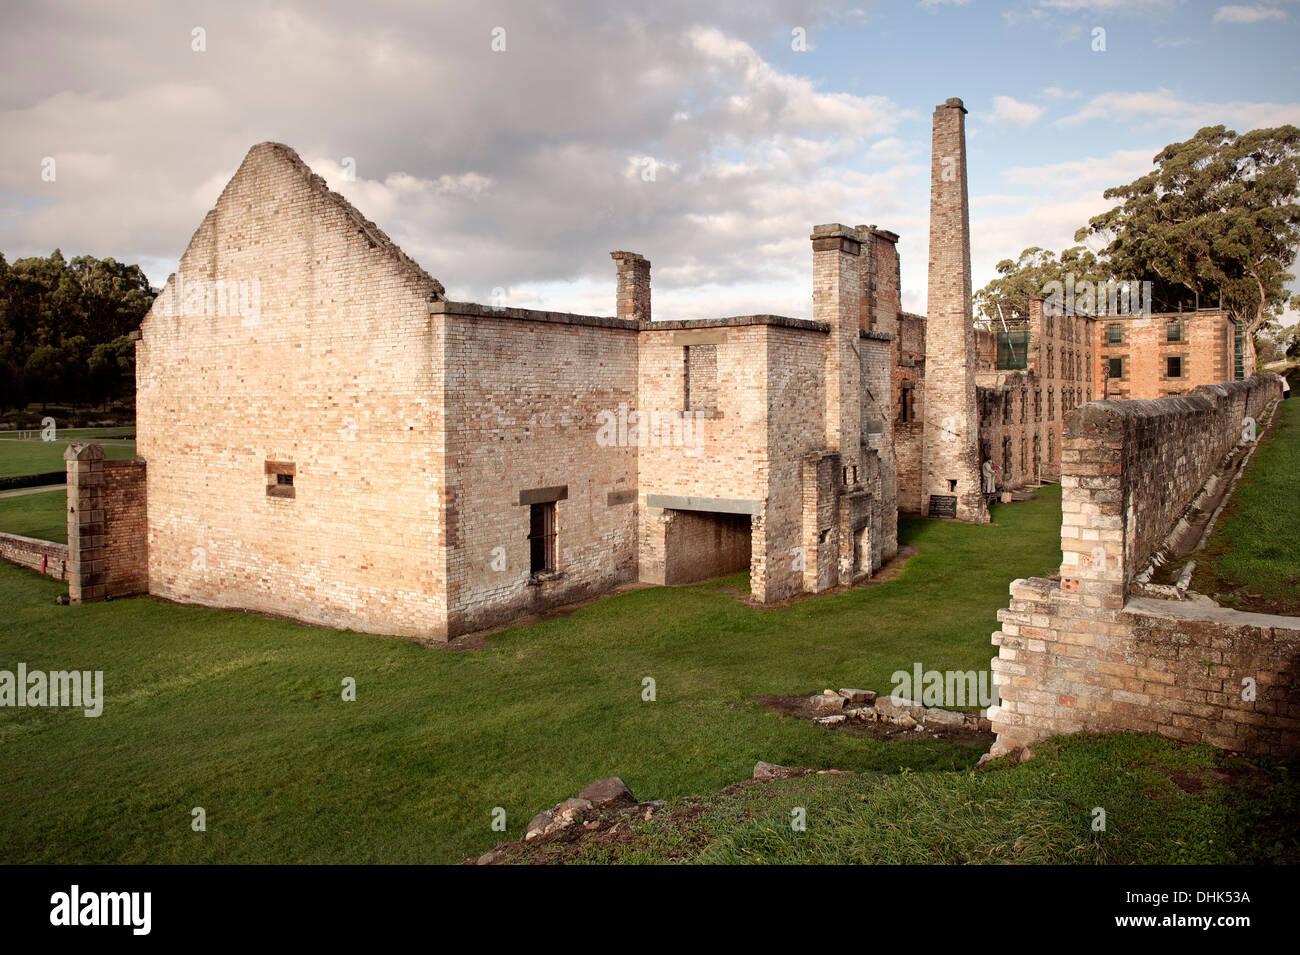 Ruins of penitentiary at Port Arthur, prison, historic site, Tasmania, Australia - Stock Image